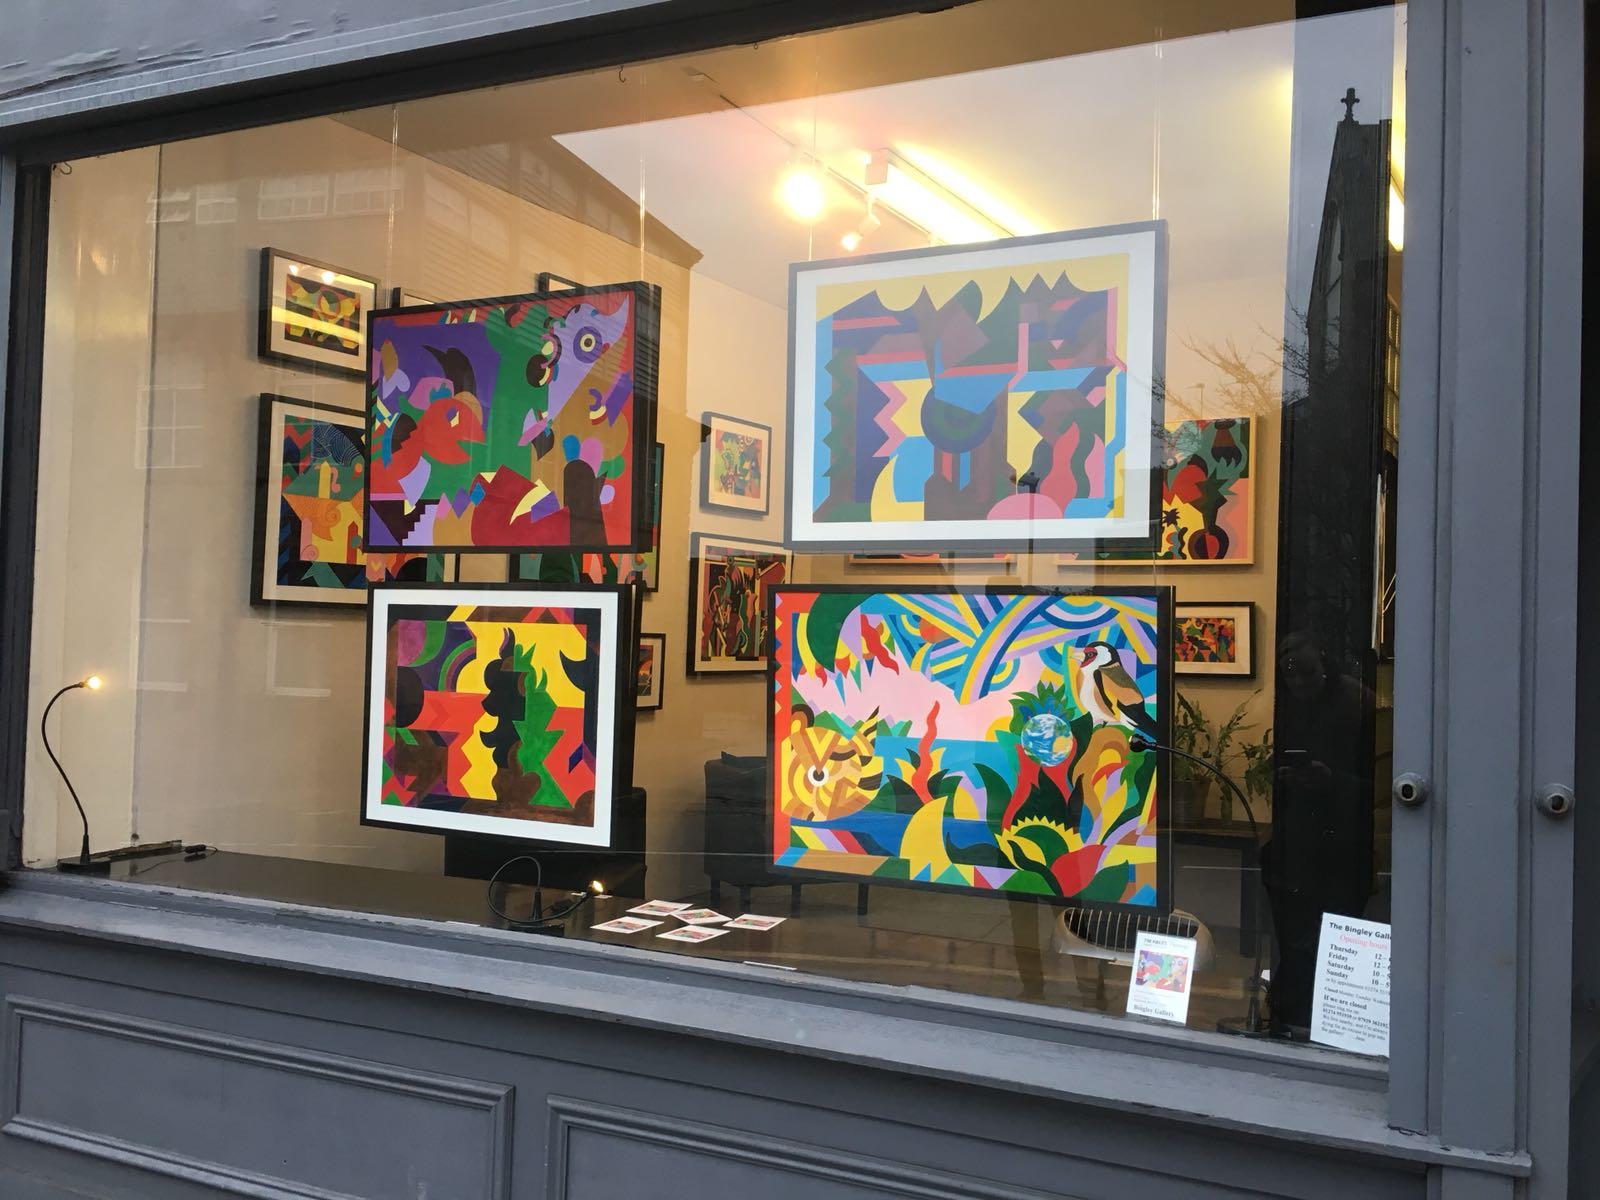 Bingley Gallery